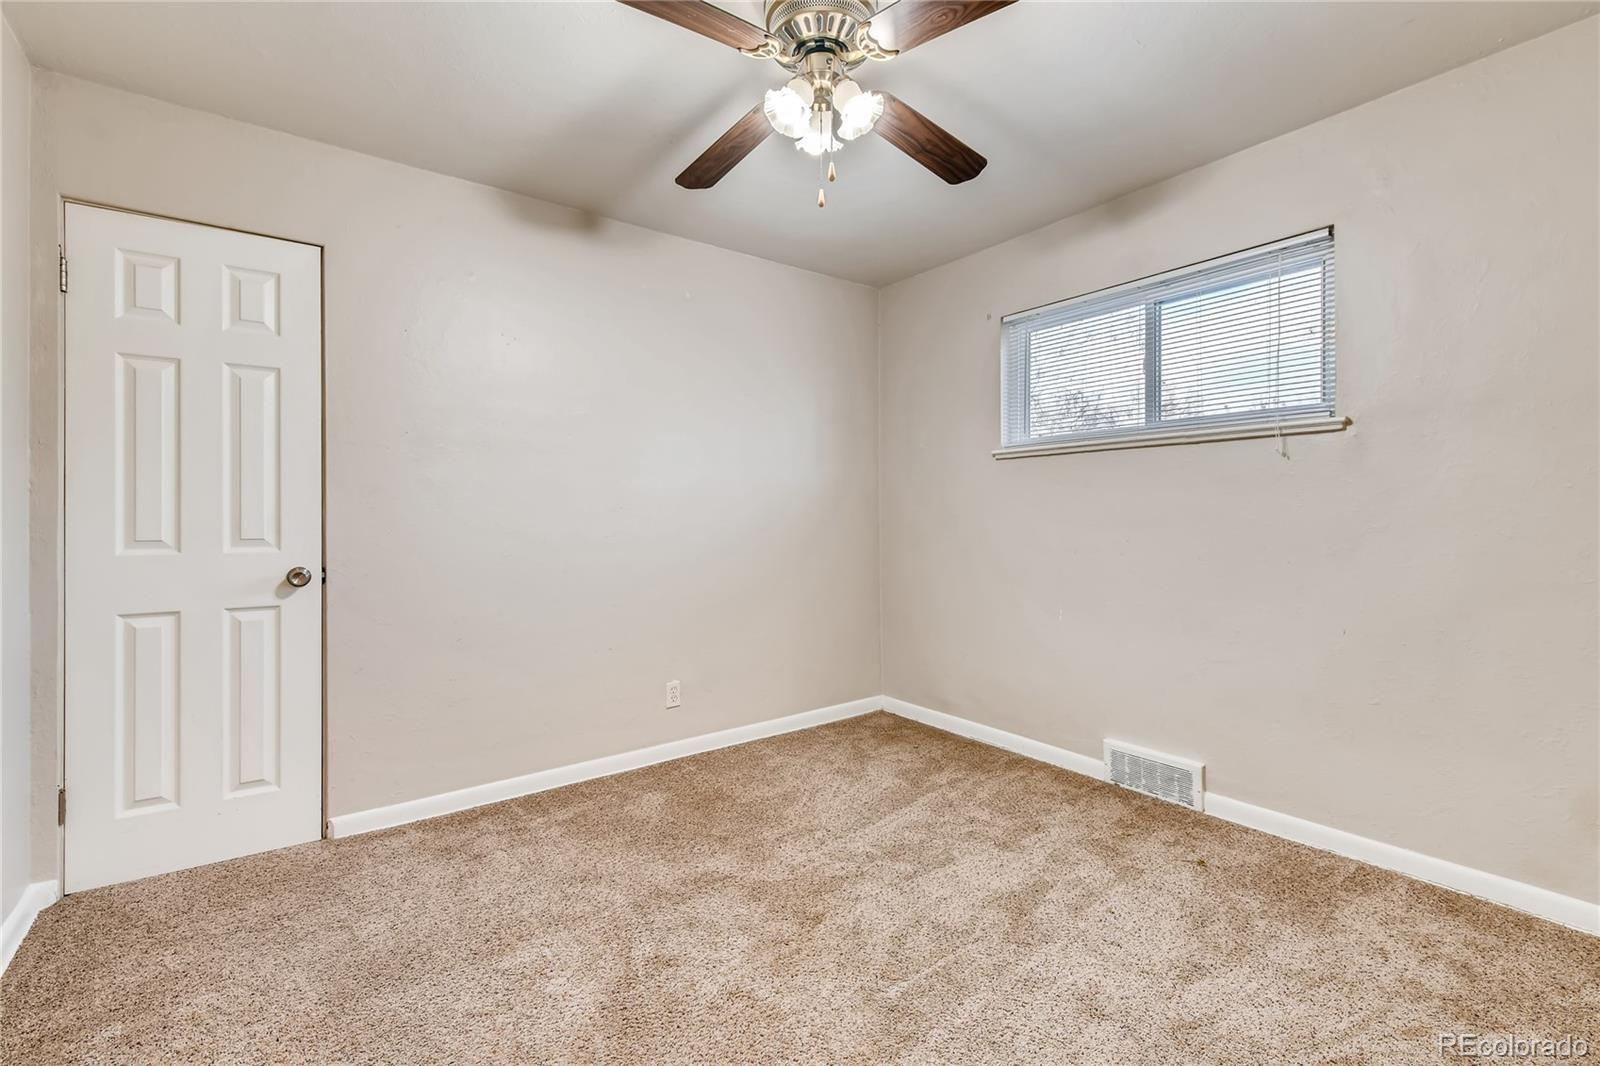 MLS# 2644155 - 7 - 3840 Ingalls Street, Wheat Ridge, CO 80033